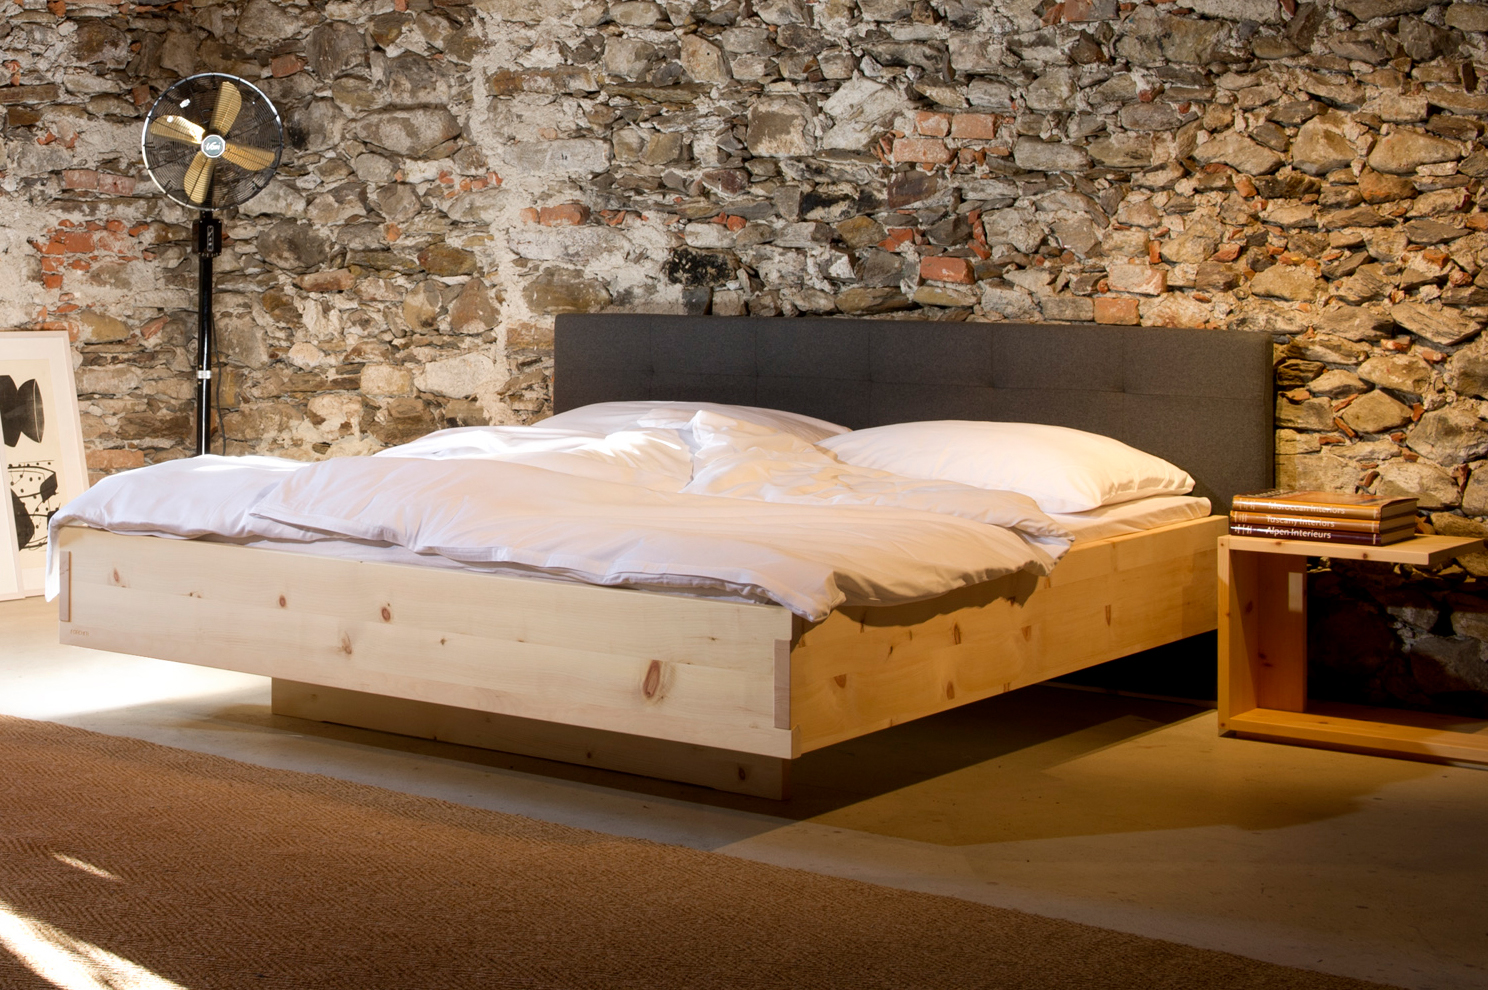 Zirbenholz Schlafzimmer, Zirbenholz Möbel, Zirbenholz Betten, Innviertel